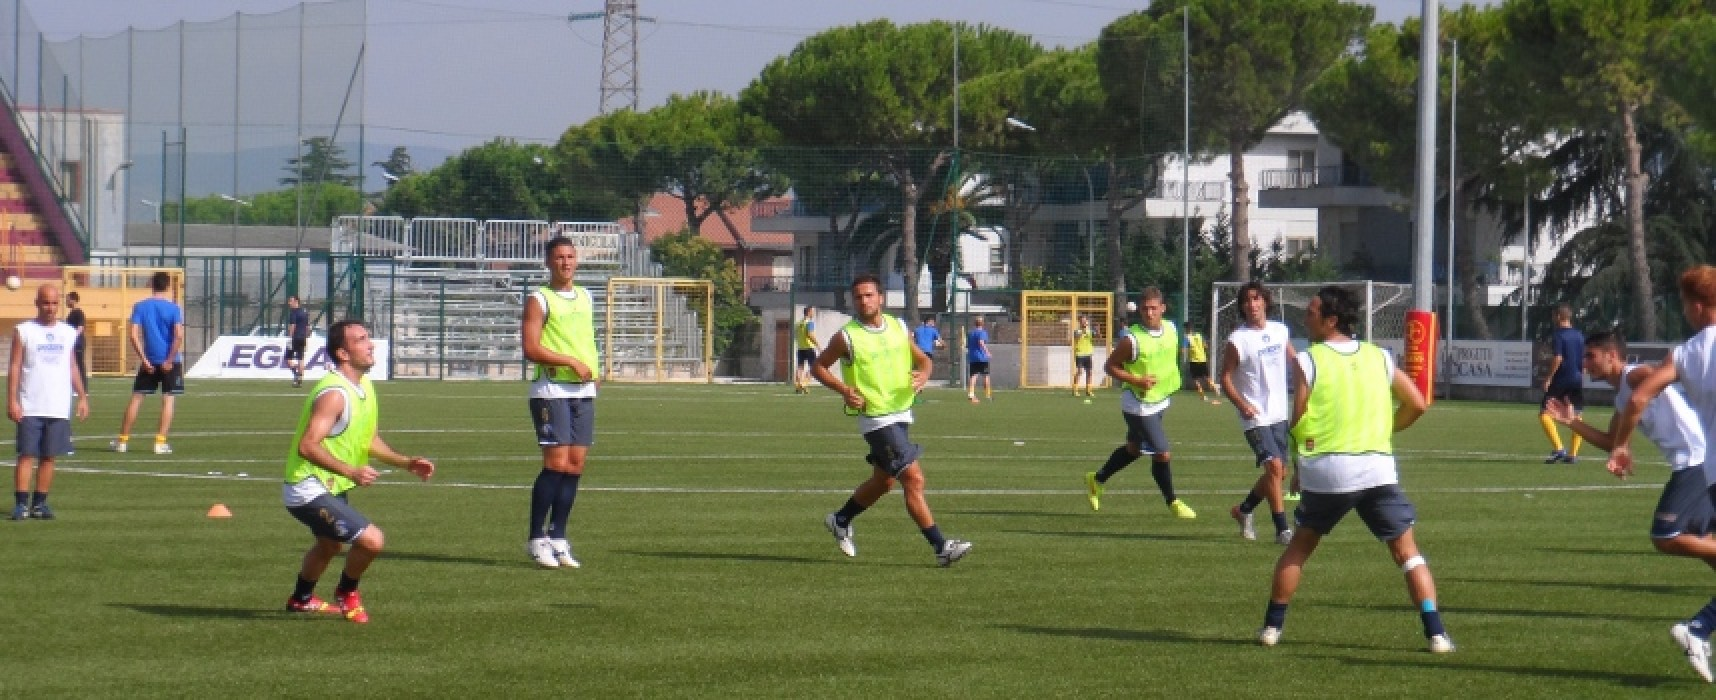 Insidia Carepelle per l'Unione Calcio.  Storico esordio per i Giovanissimi Regionali